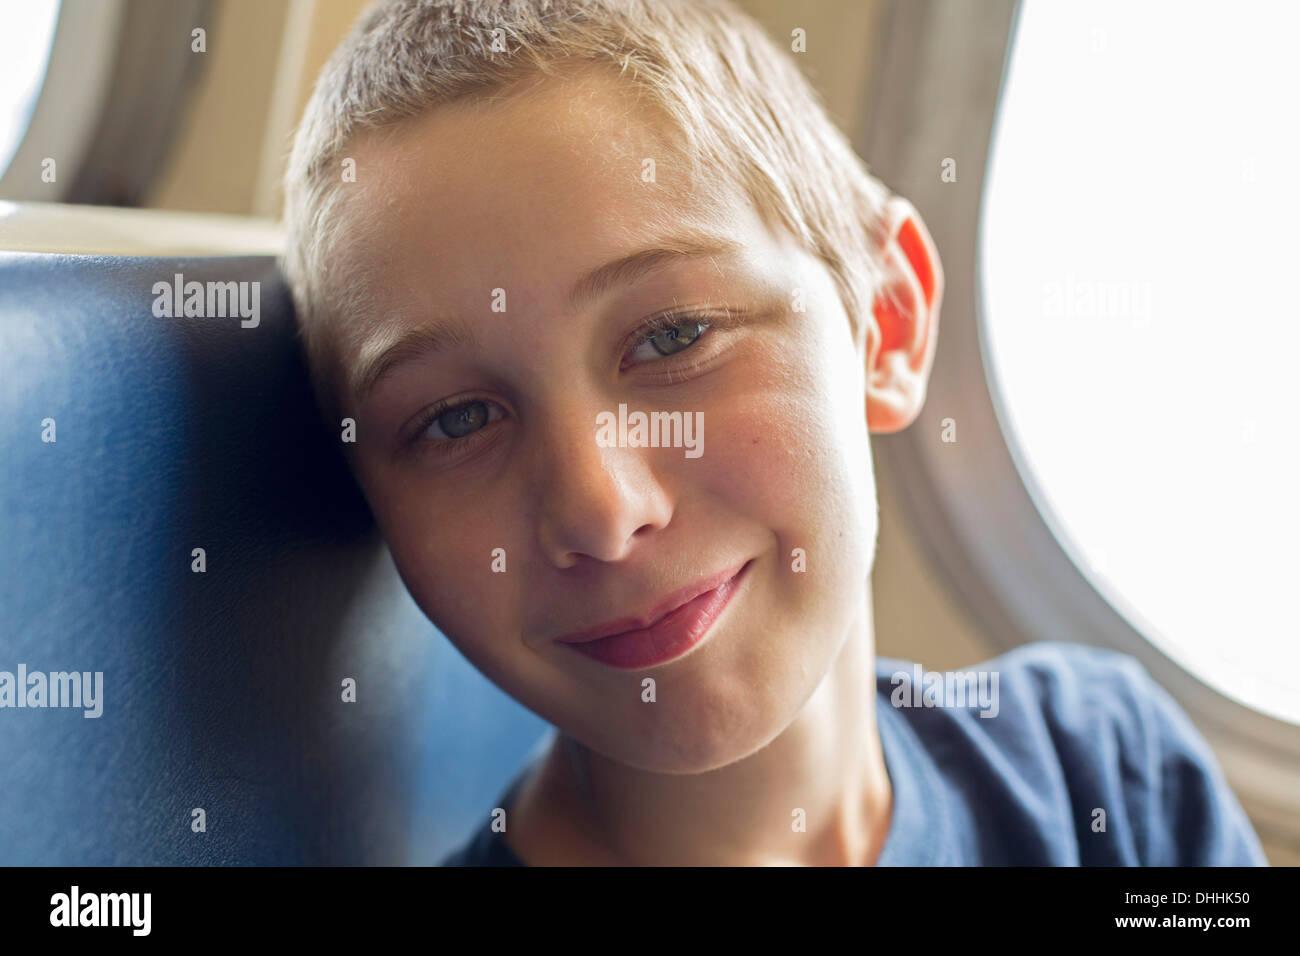 Close up portrait of boy - Stock Image